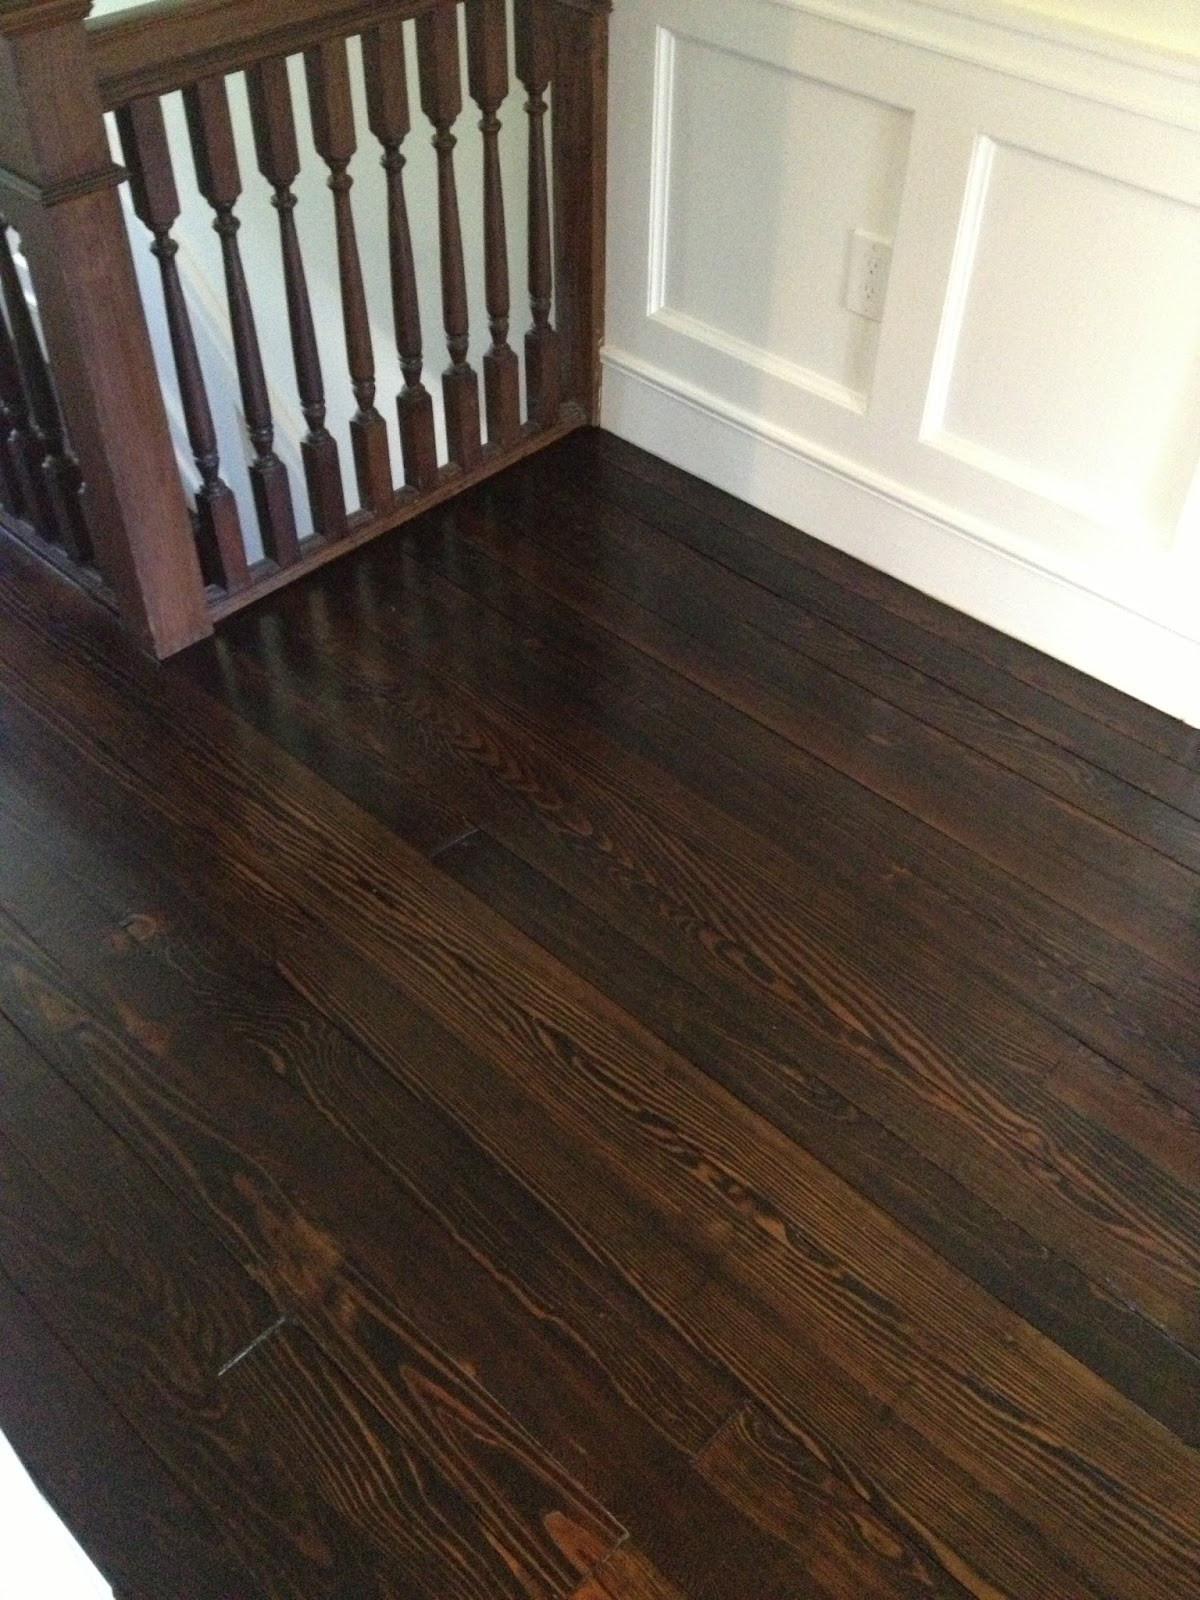 preparing hardwood floors for refinishing of wood floor jacobean wood floor stain with regard to images of jacobean wood floor stain